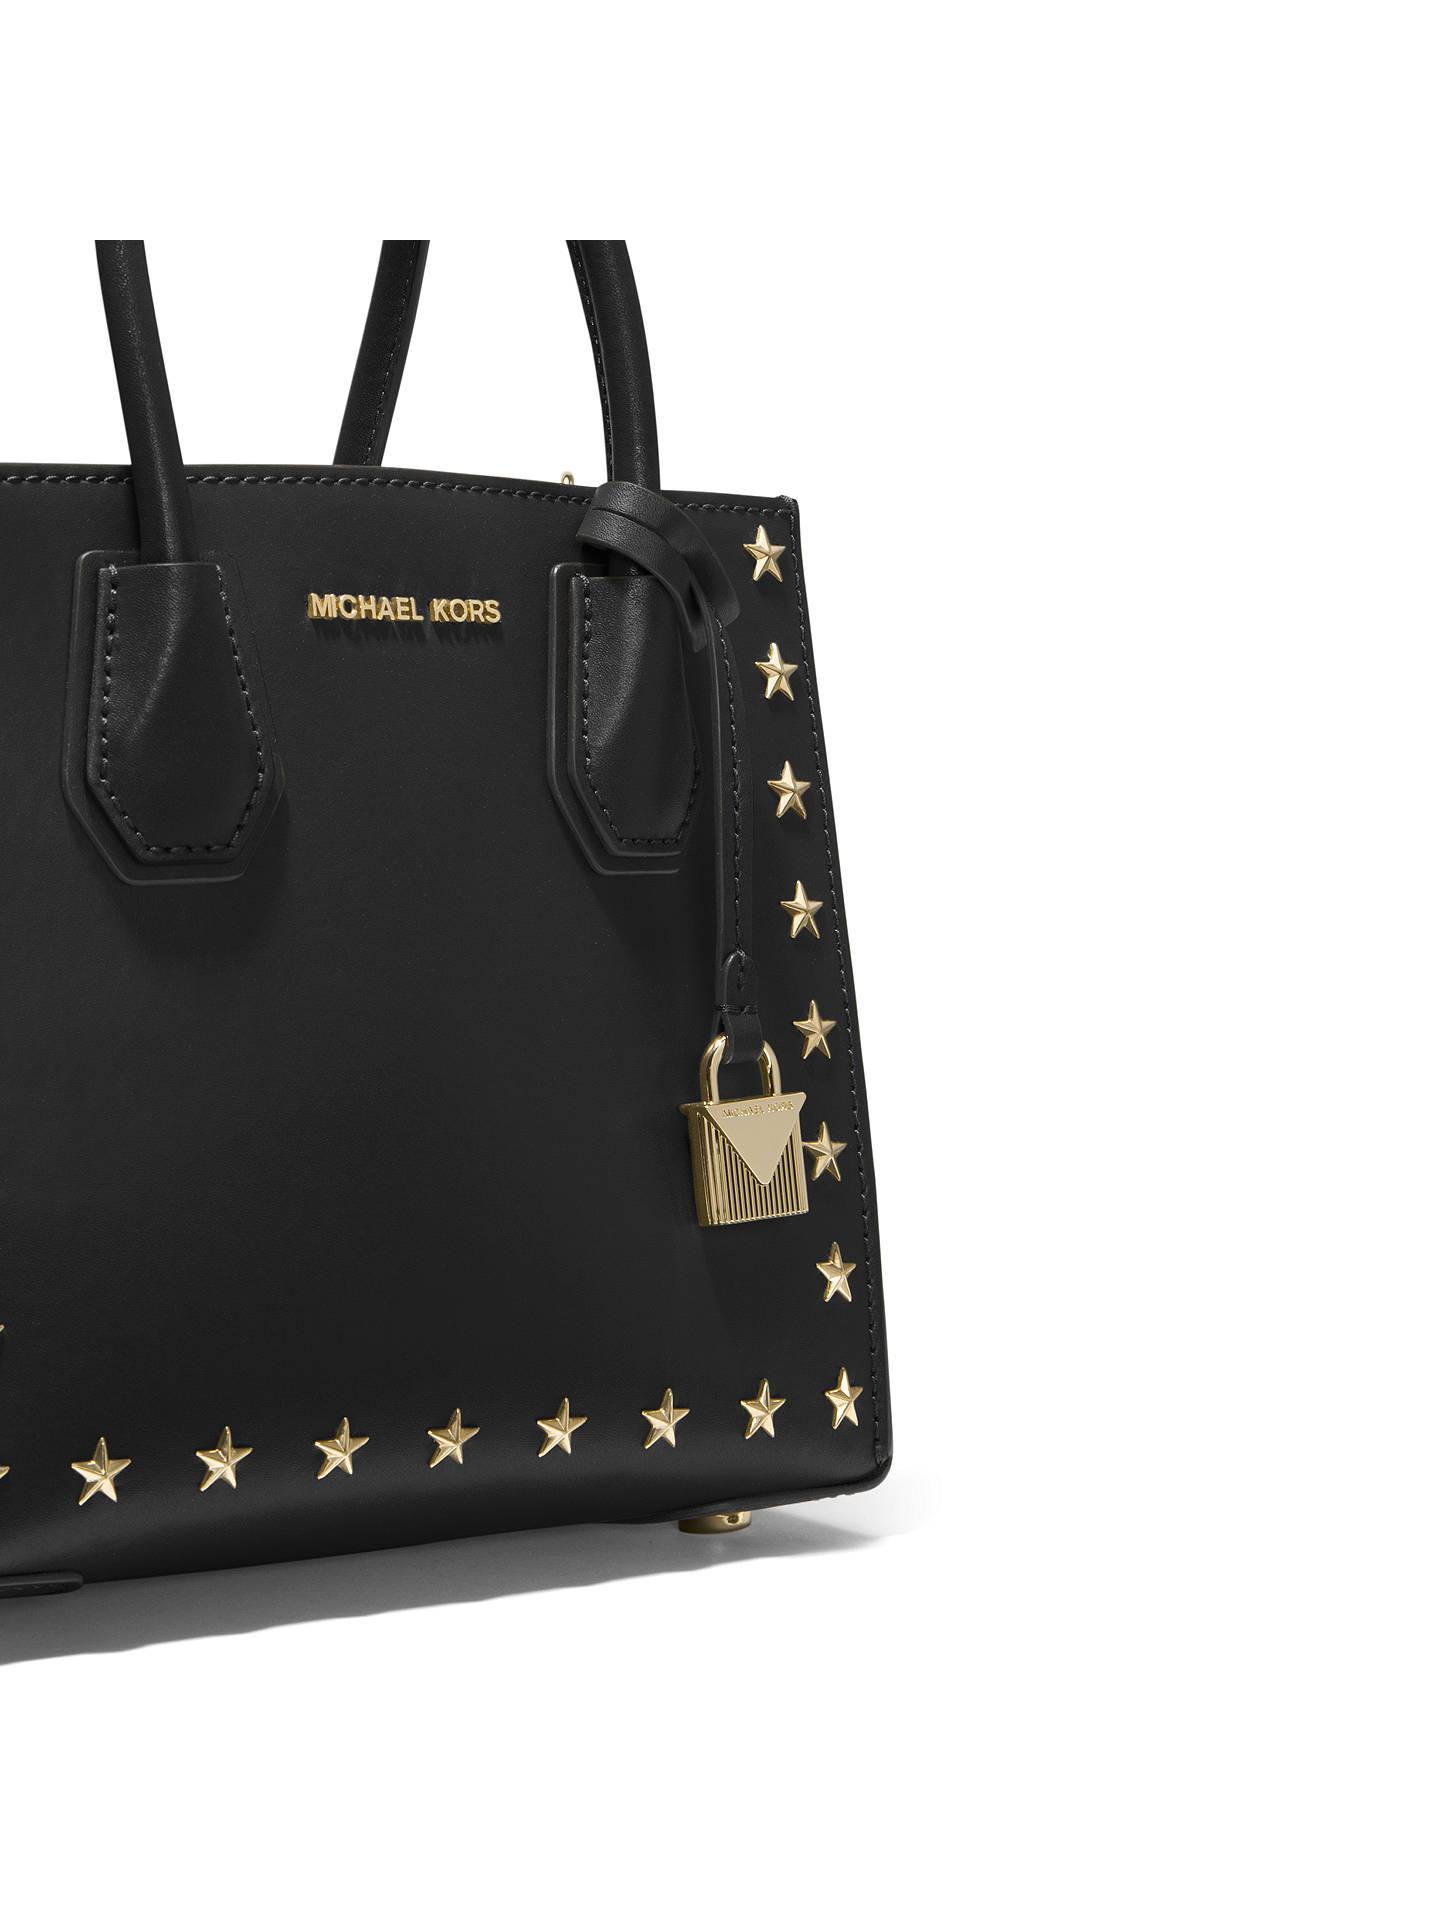 MICHAEL Michael Kors Mercer Leather Star Studded Tote Bag